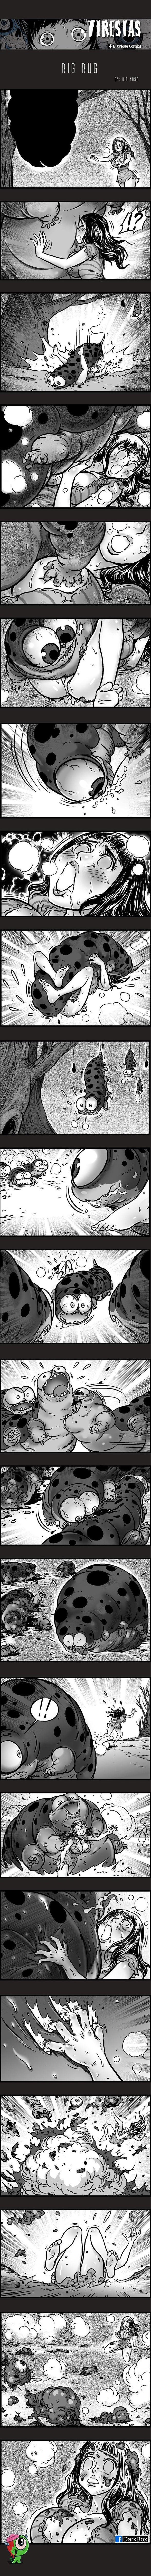 Большой жук Tiresias, DarkBox, Комиксы, Длиннопост